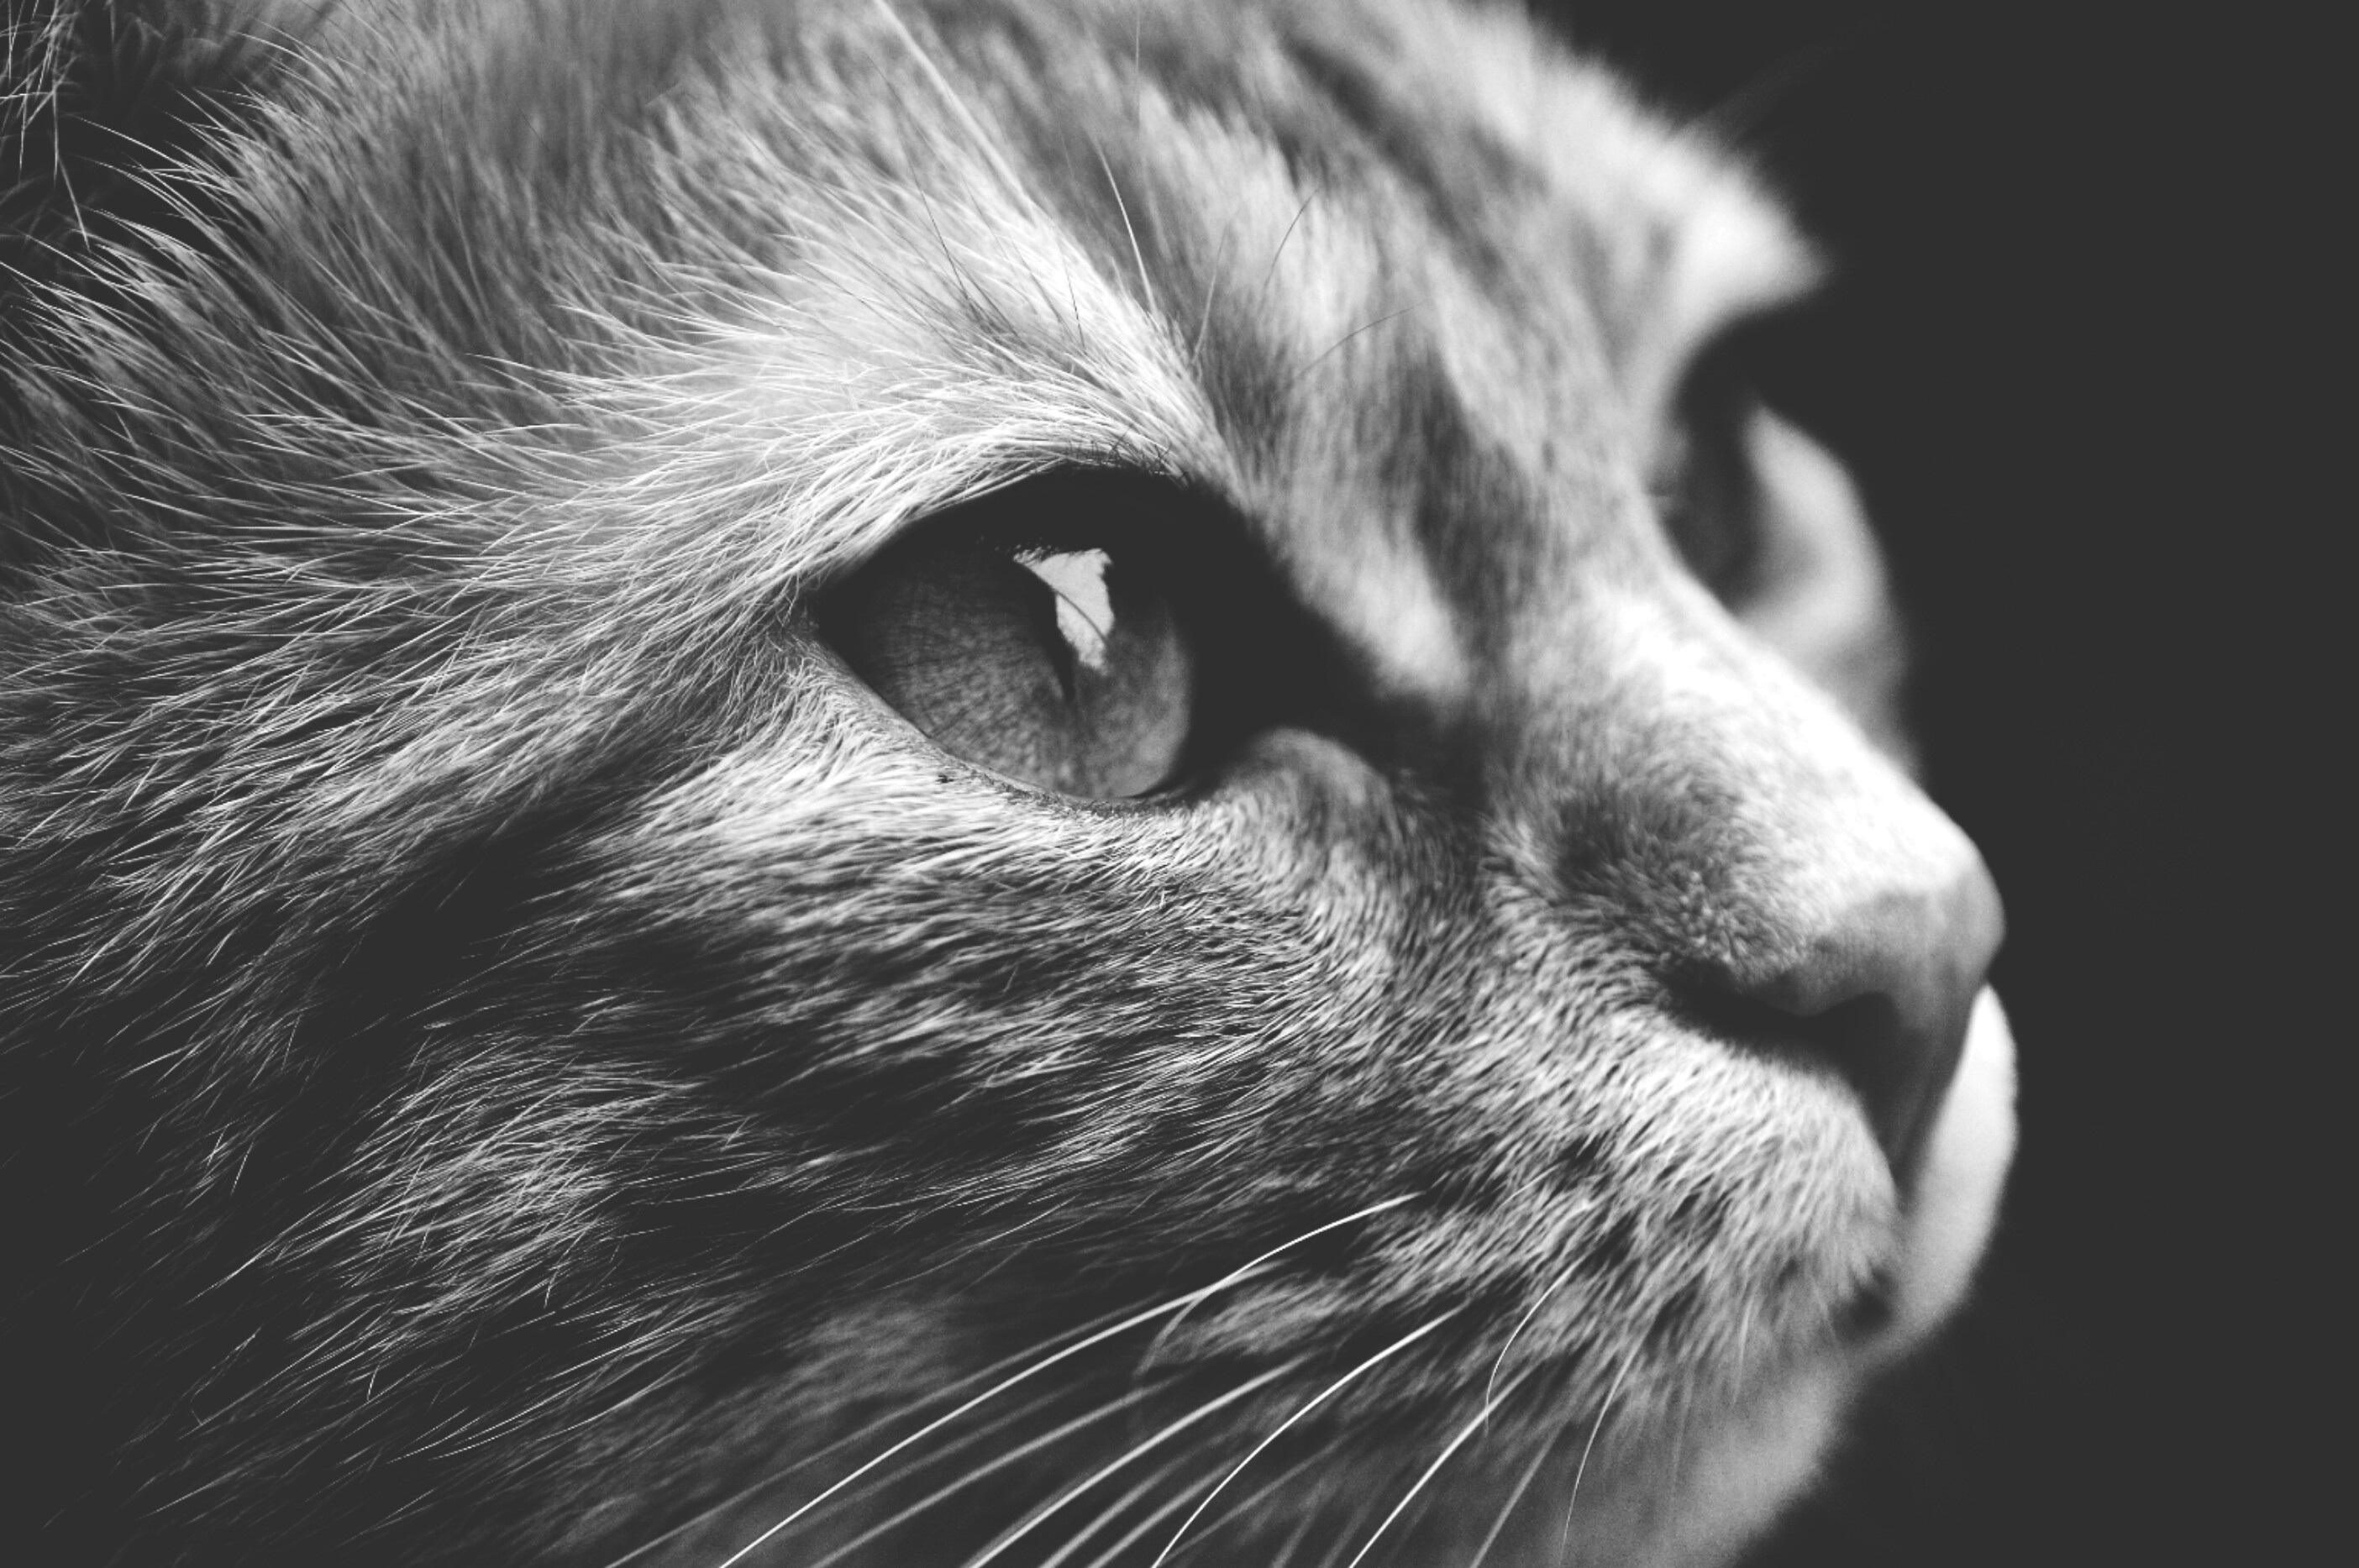 Free images black and white sweet cute pet fur kitten playful close up nose whiskers snout tiger eye adidas vertebrate organ cuddly